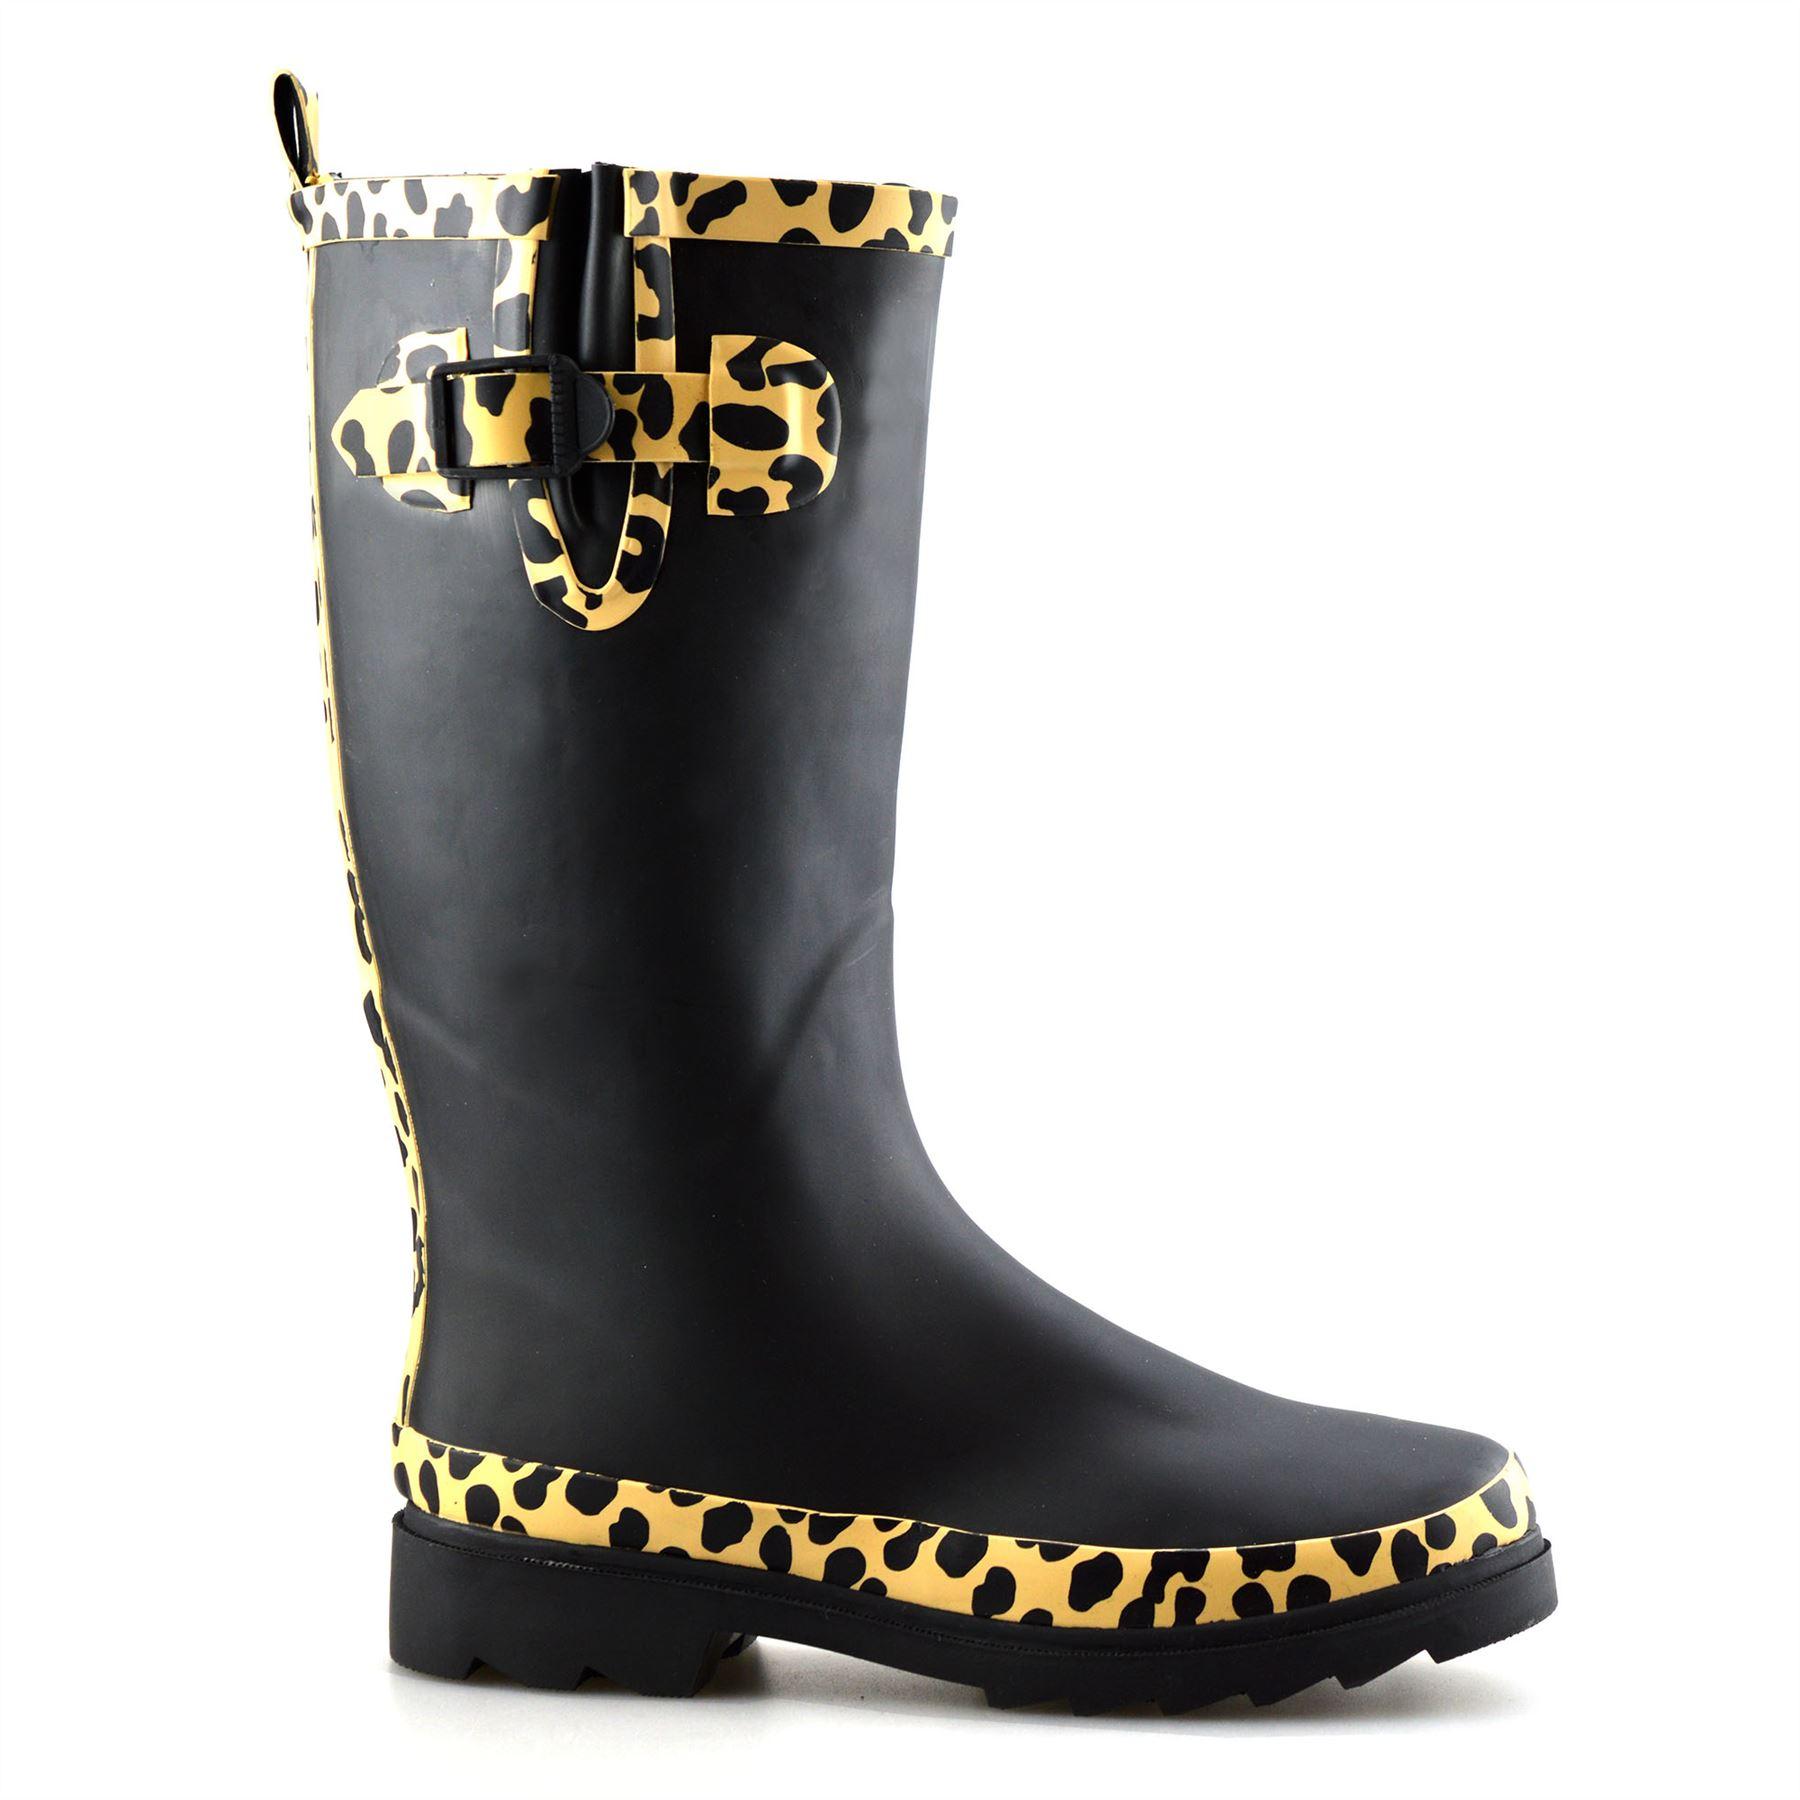 Womens Wellington Boots Festival Rain Snow Wellies Ladies Waterproof Shoes